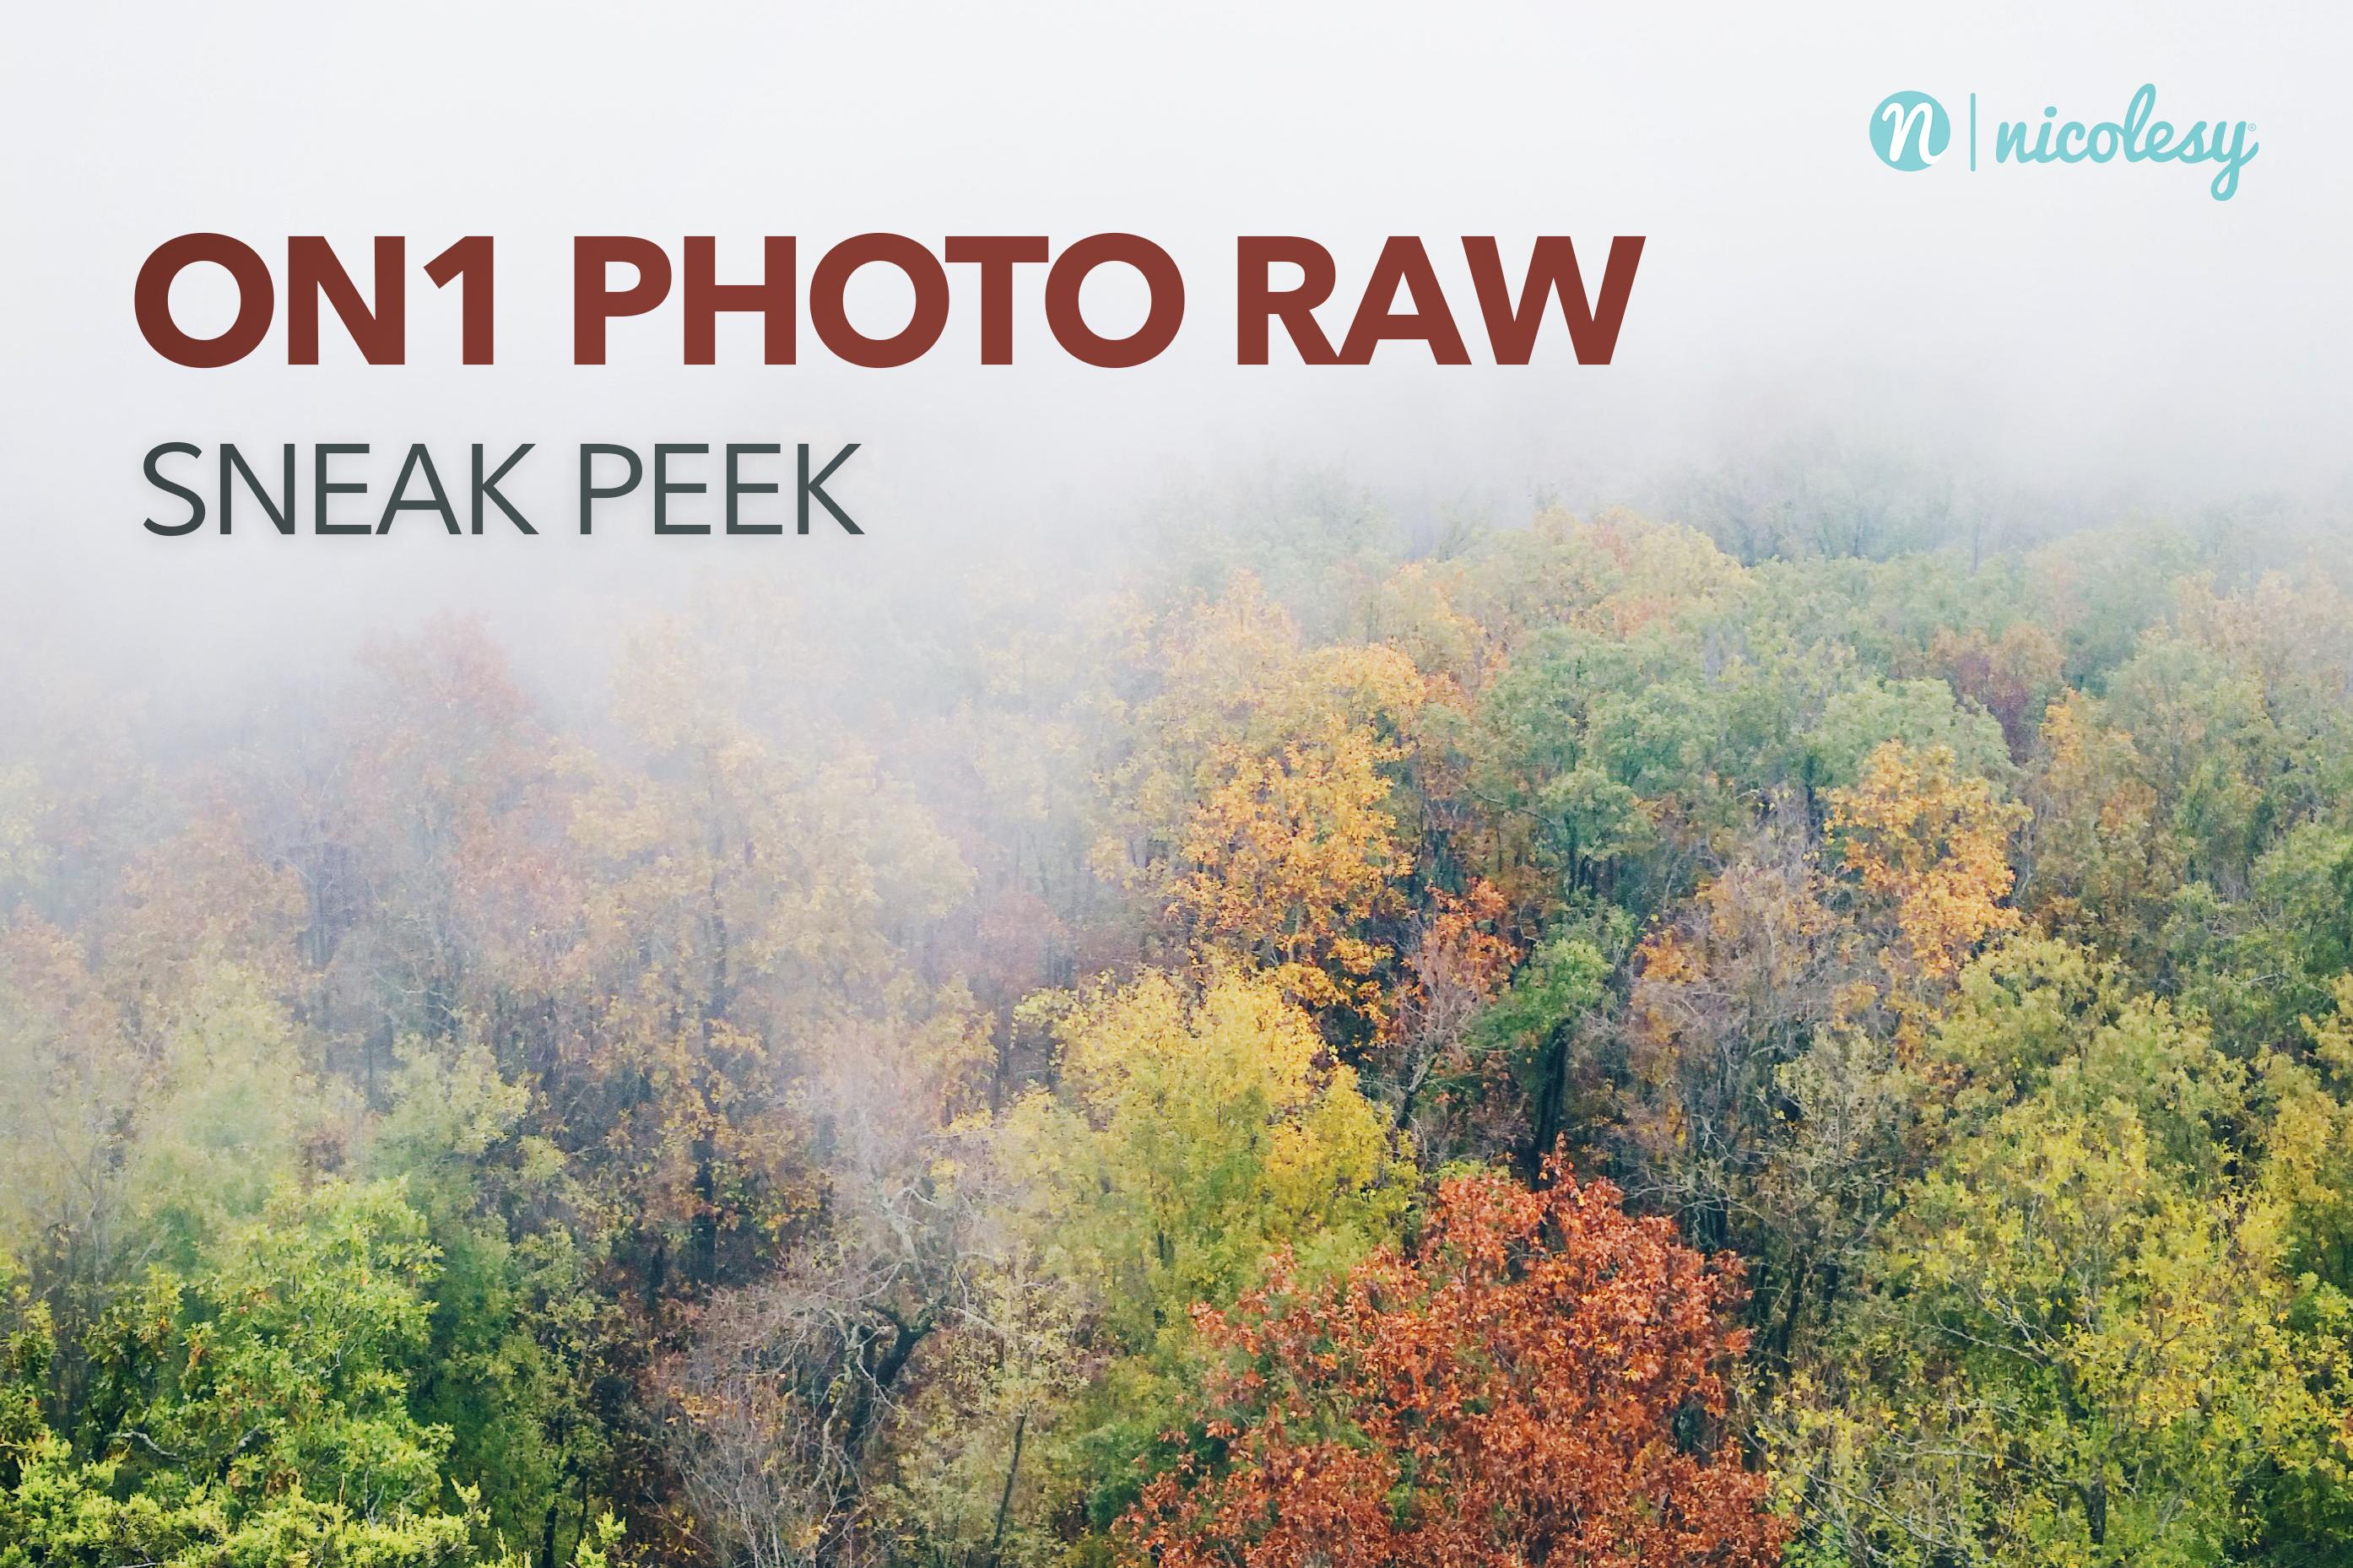 Sneak Peek: ON1 Photo RAW